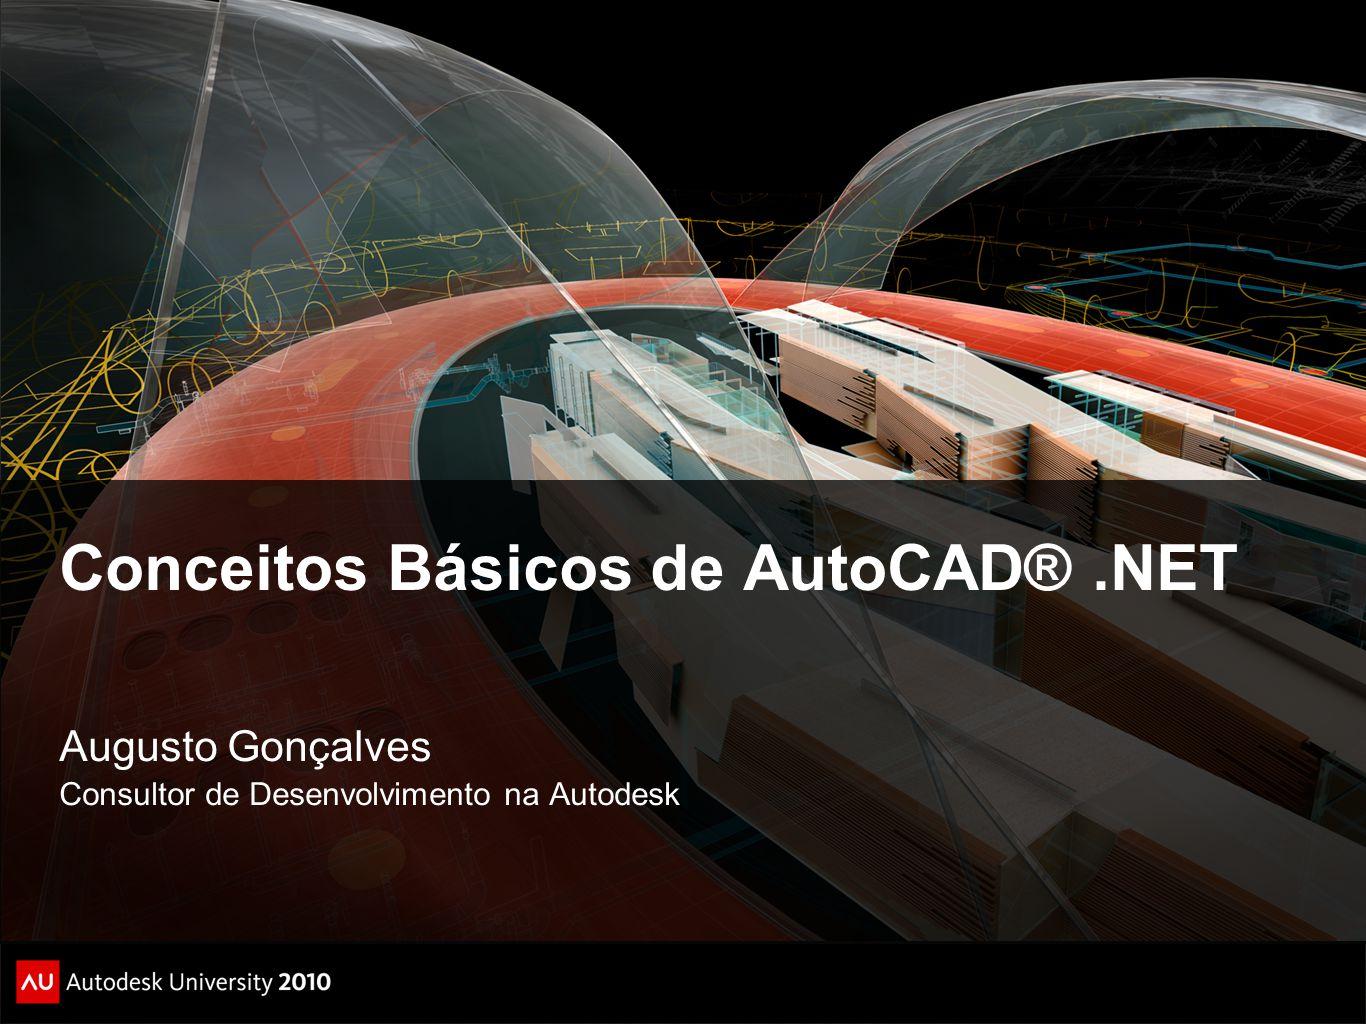 Conceitos Básicos de AutoCAD®.NET Augusto Gonçalves Consultor de Desenvolvimento na Autodesk